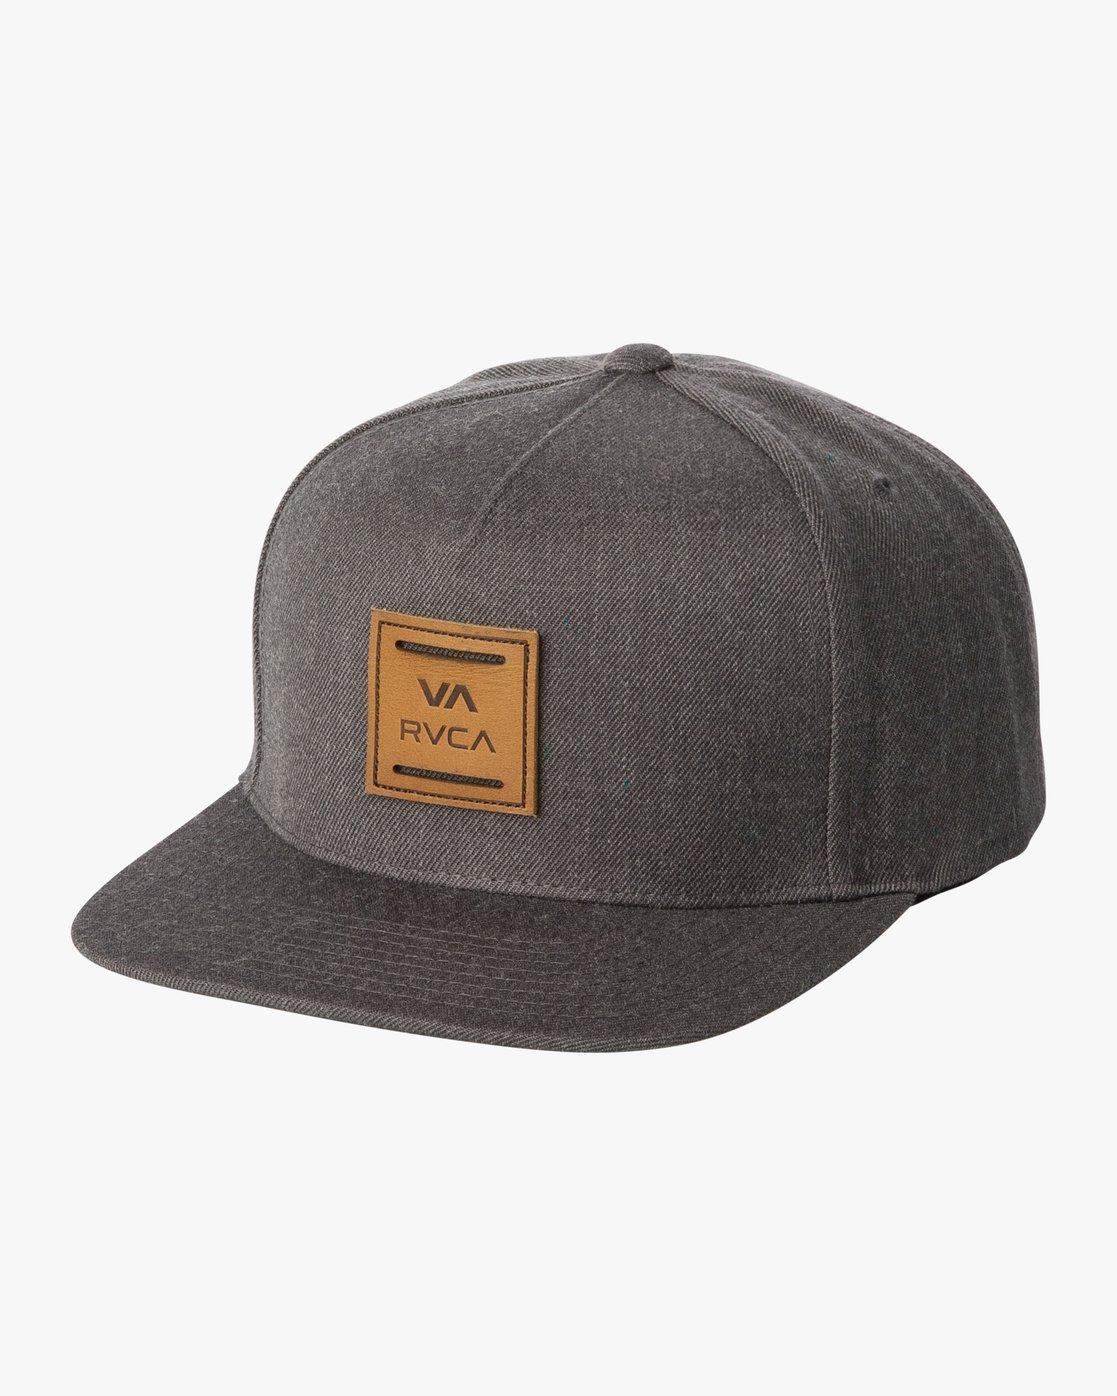 0 VA All The Way Snapback Hat Brown MAHWWRVS RVCA